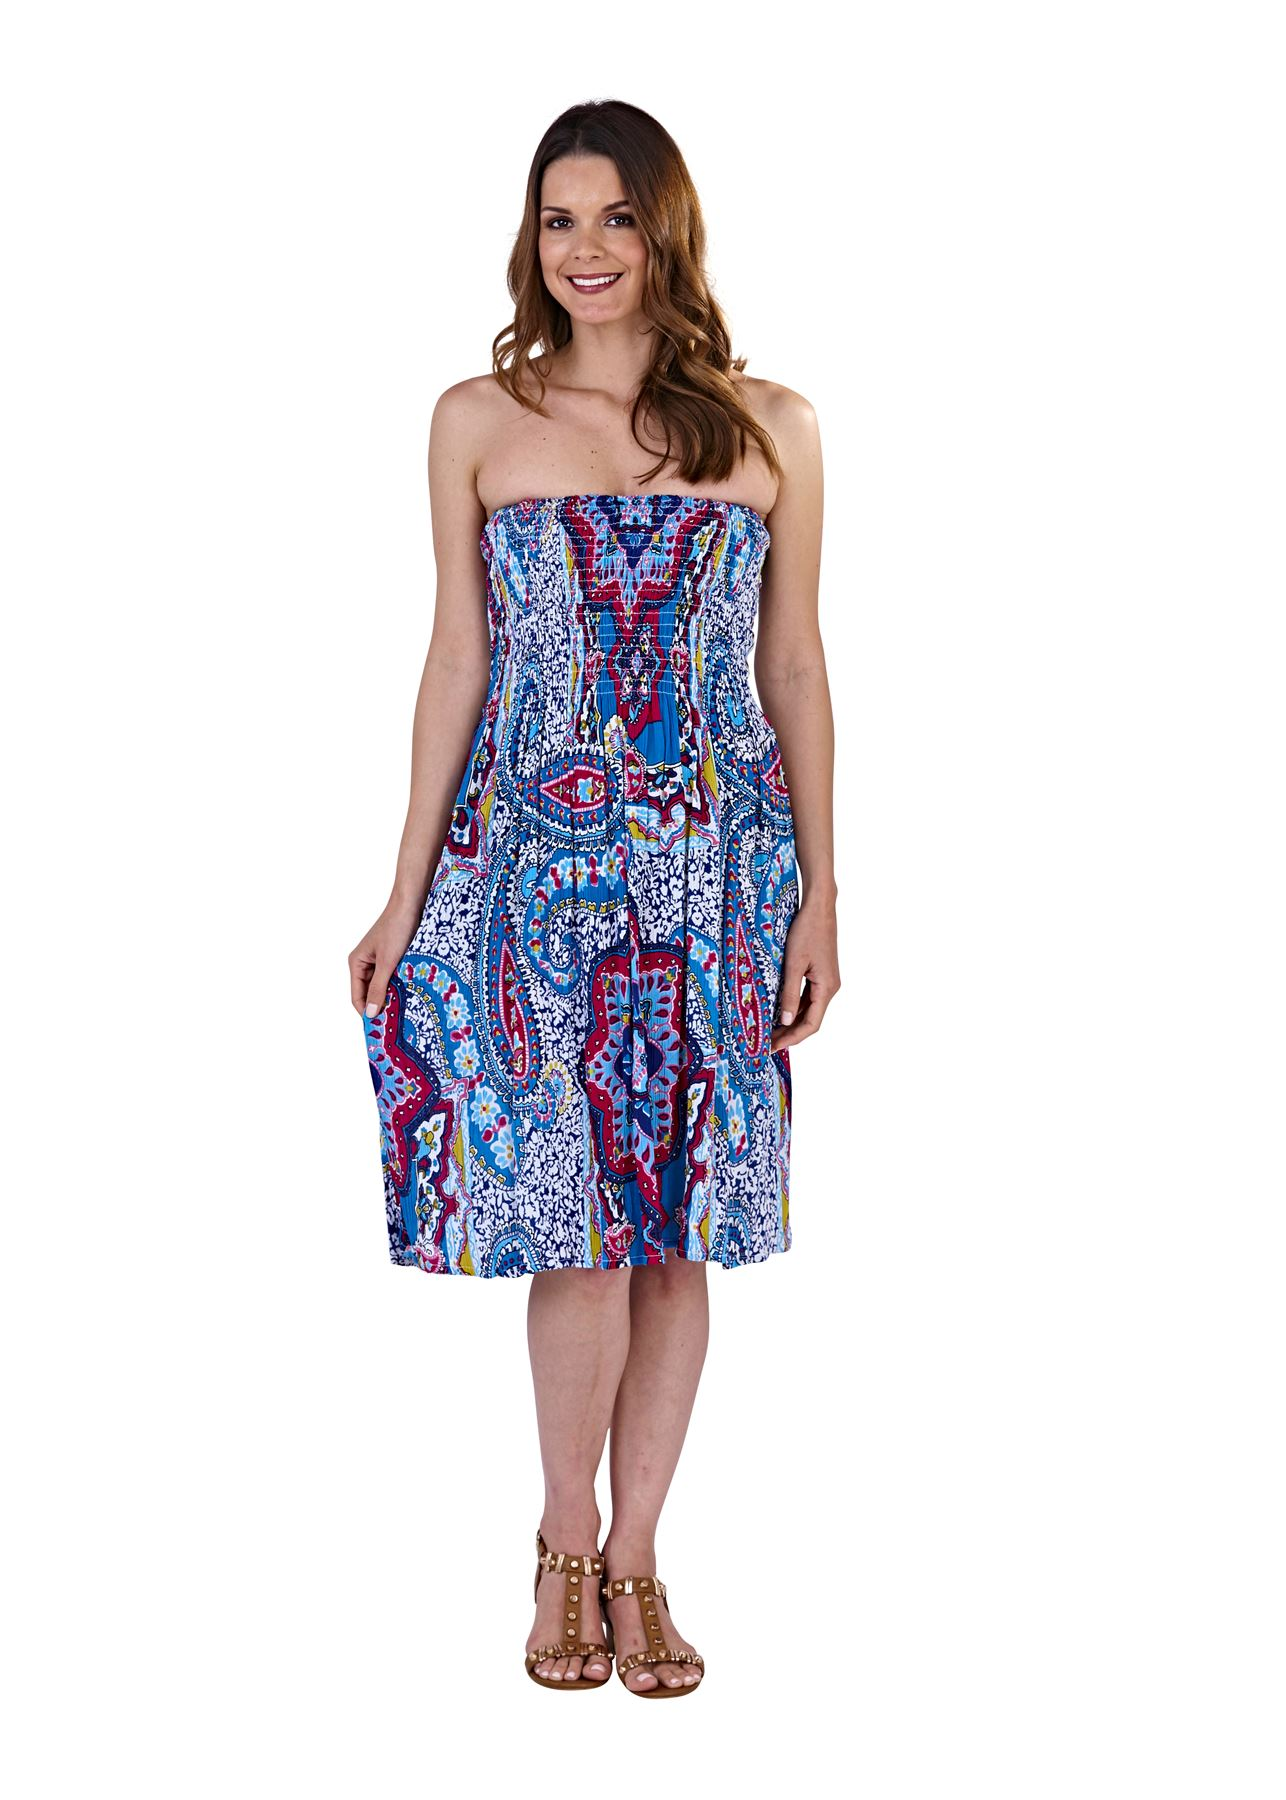 Ladies-Pistachio-Viscose-3-Way-Halter-Bandeau-Skirt-Summer-Beach-Dresses thumbnail 3